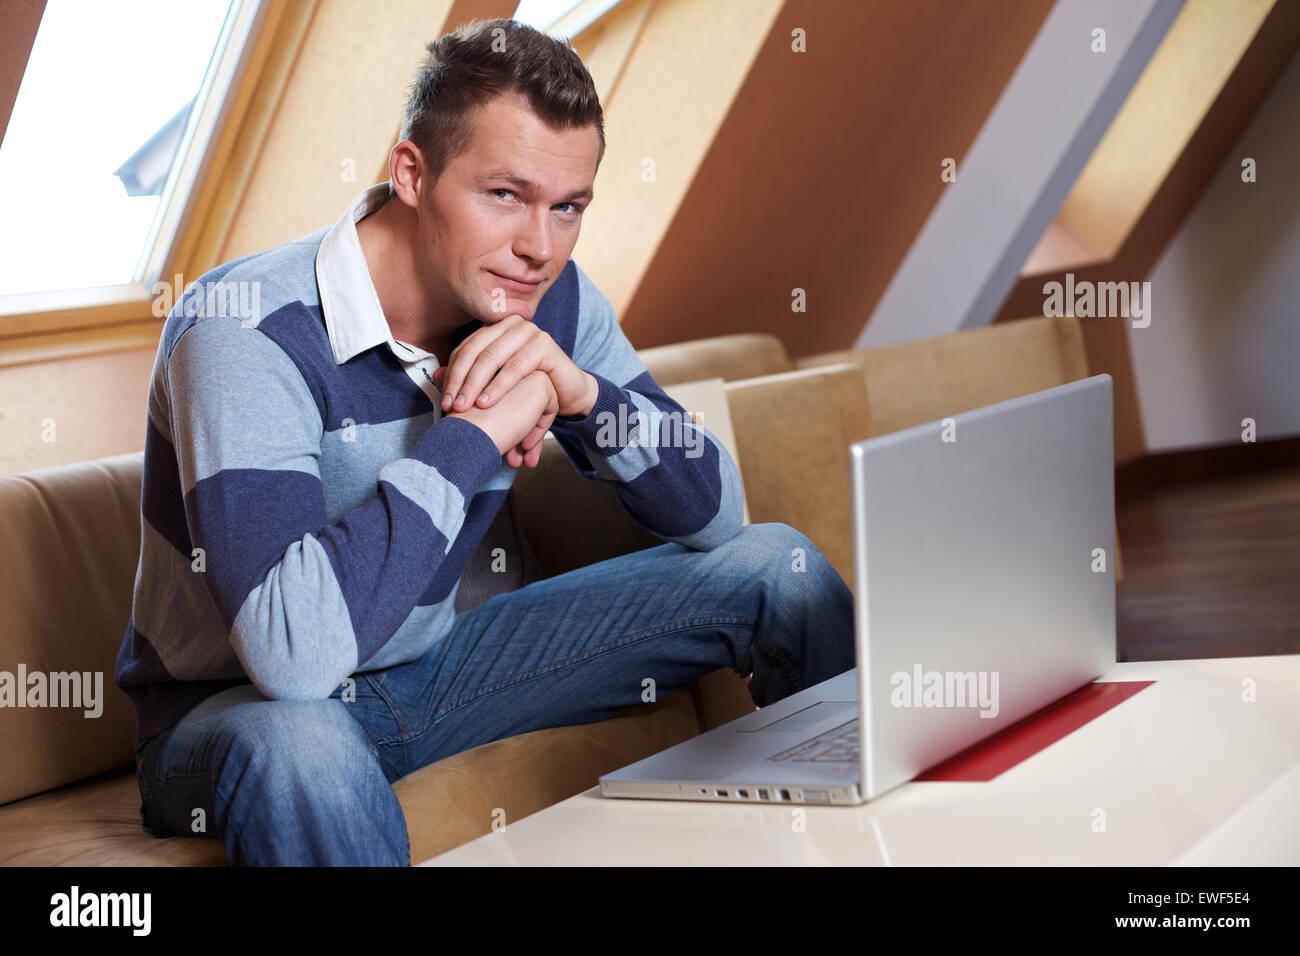 Man sitting on sofa - Stock Image